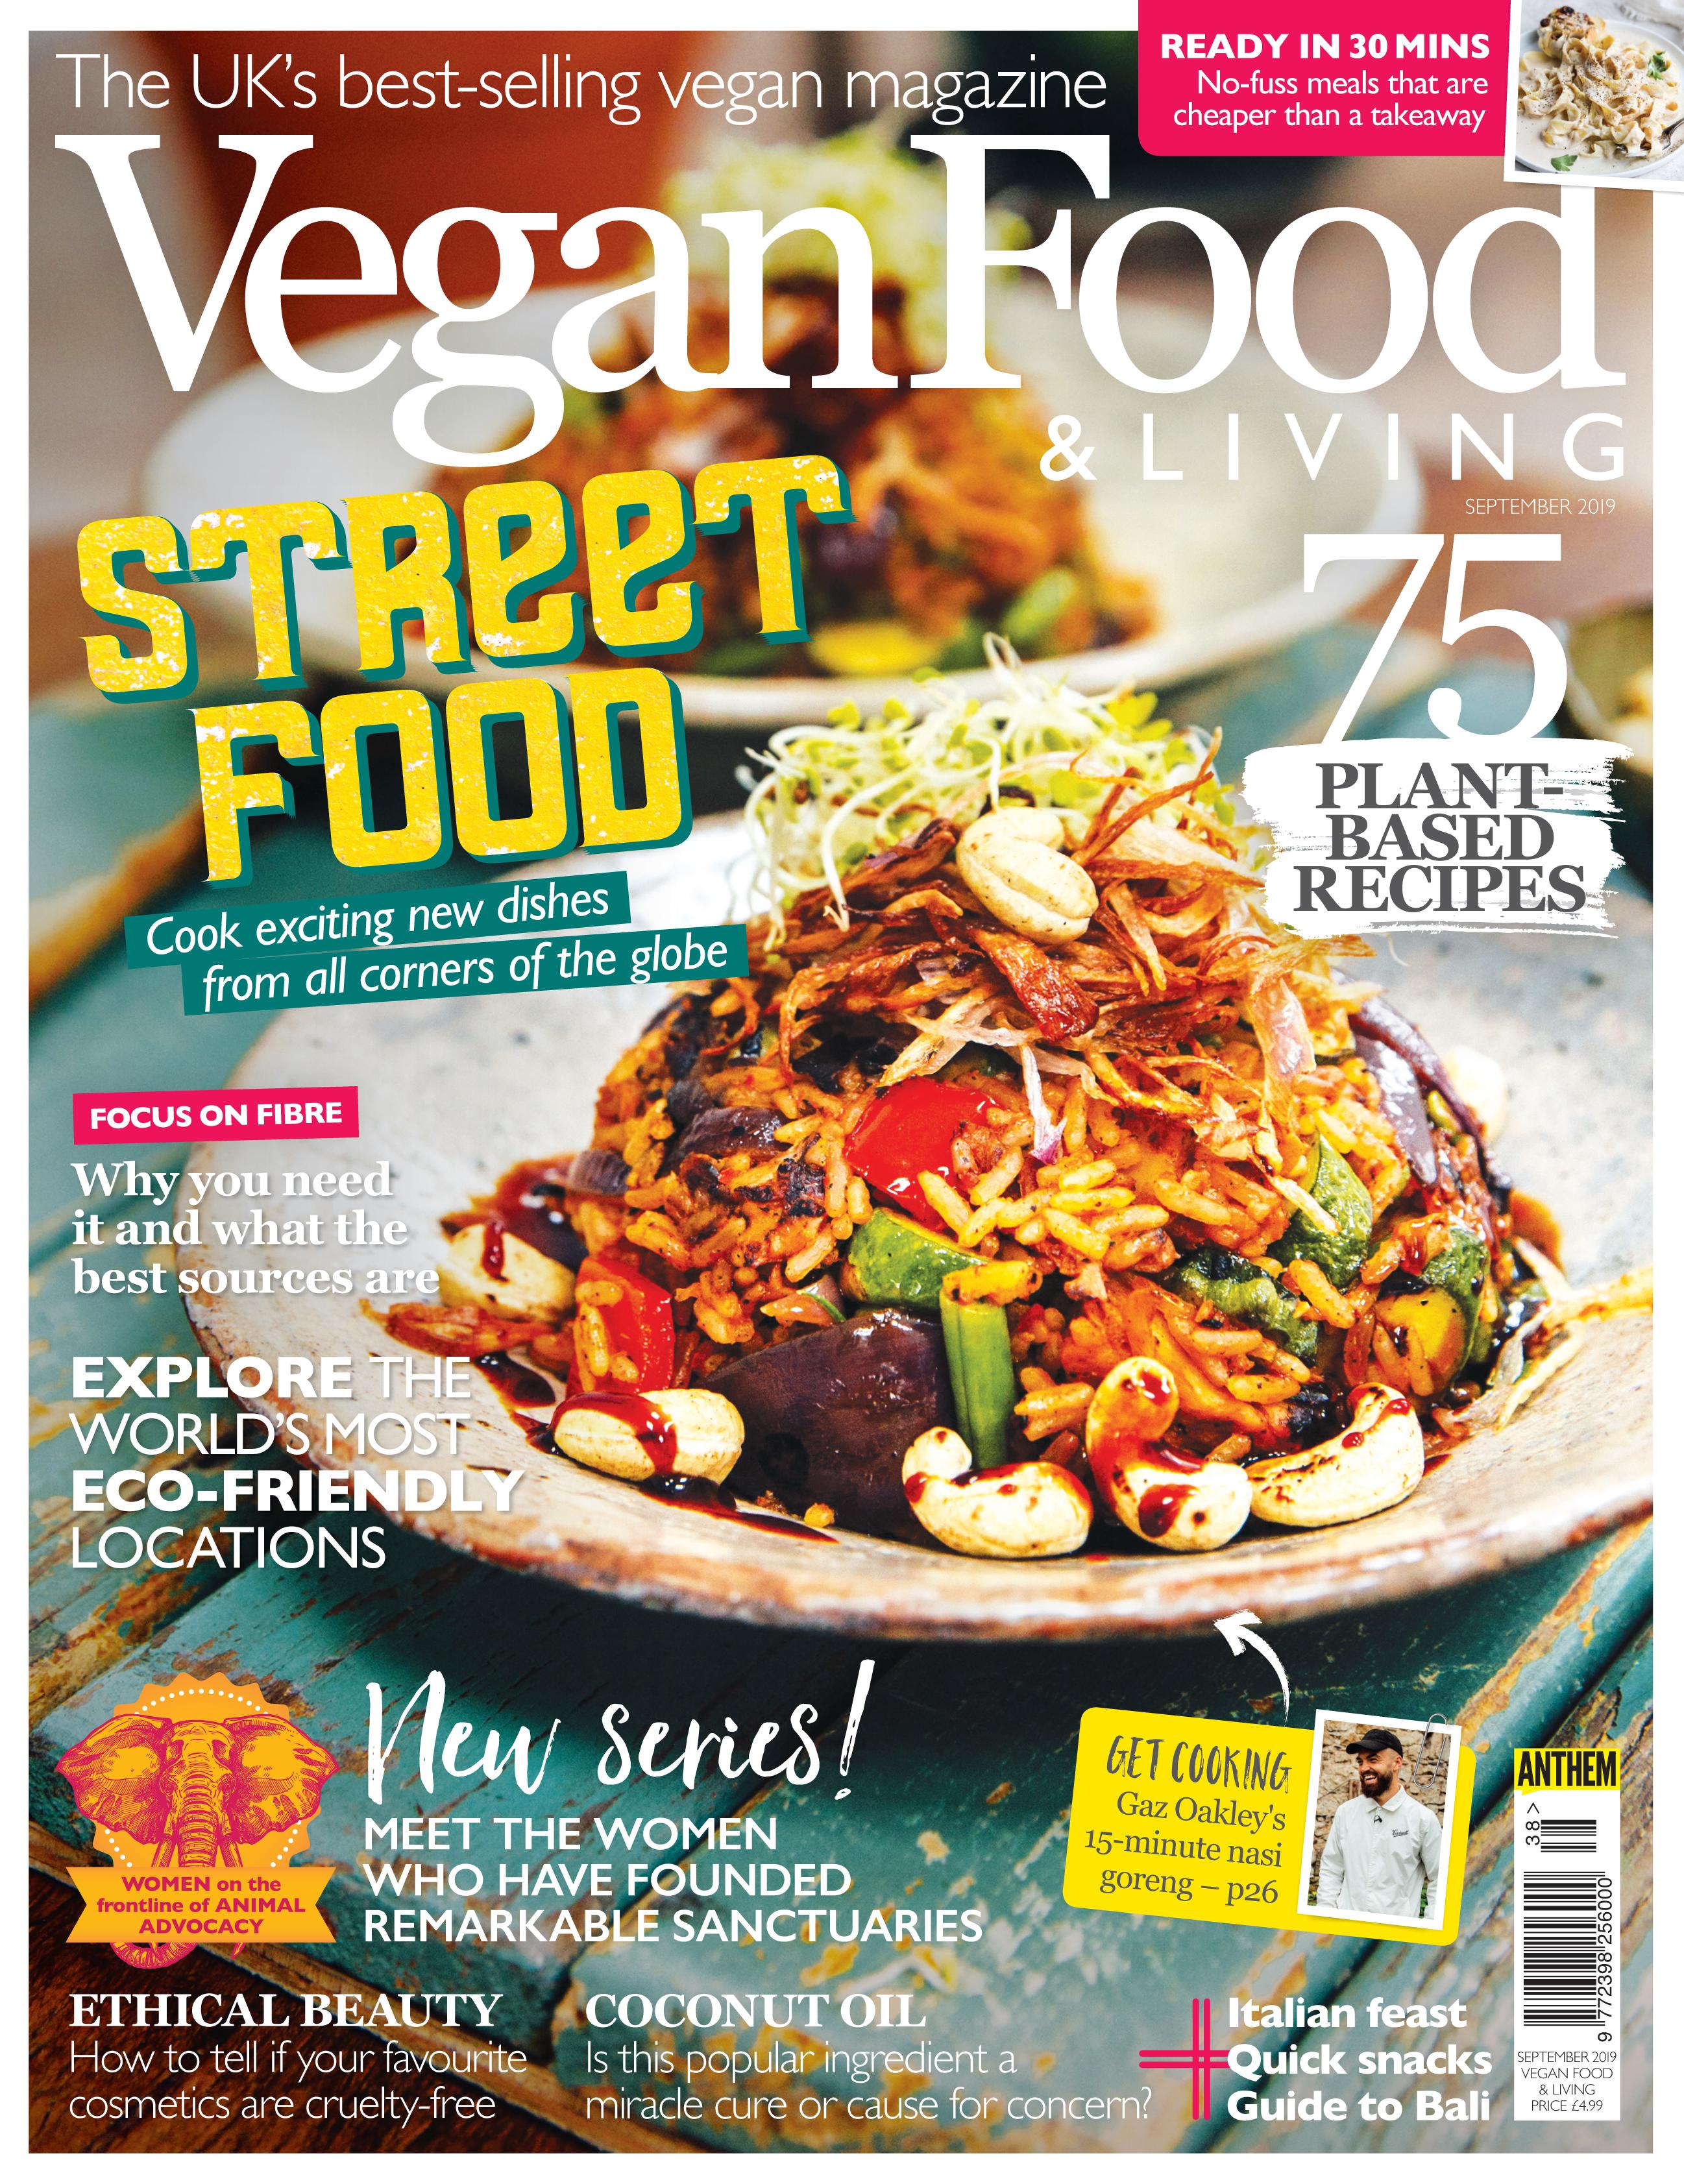 Vegan Food & Living Latest Issue